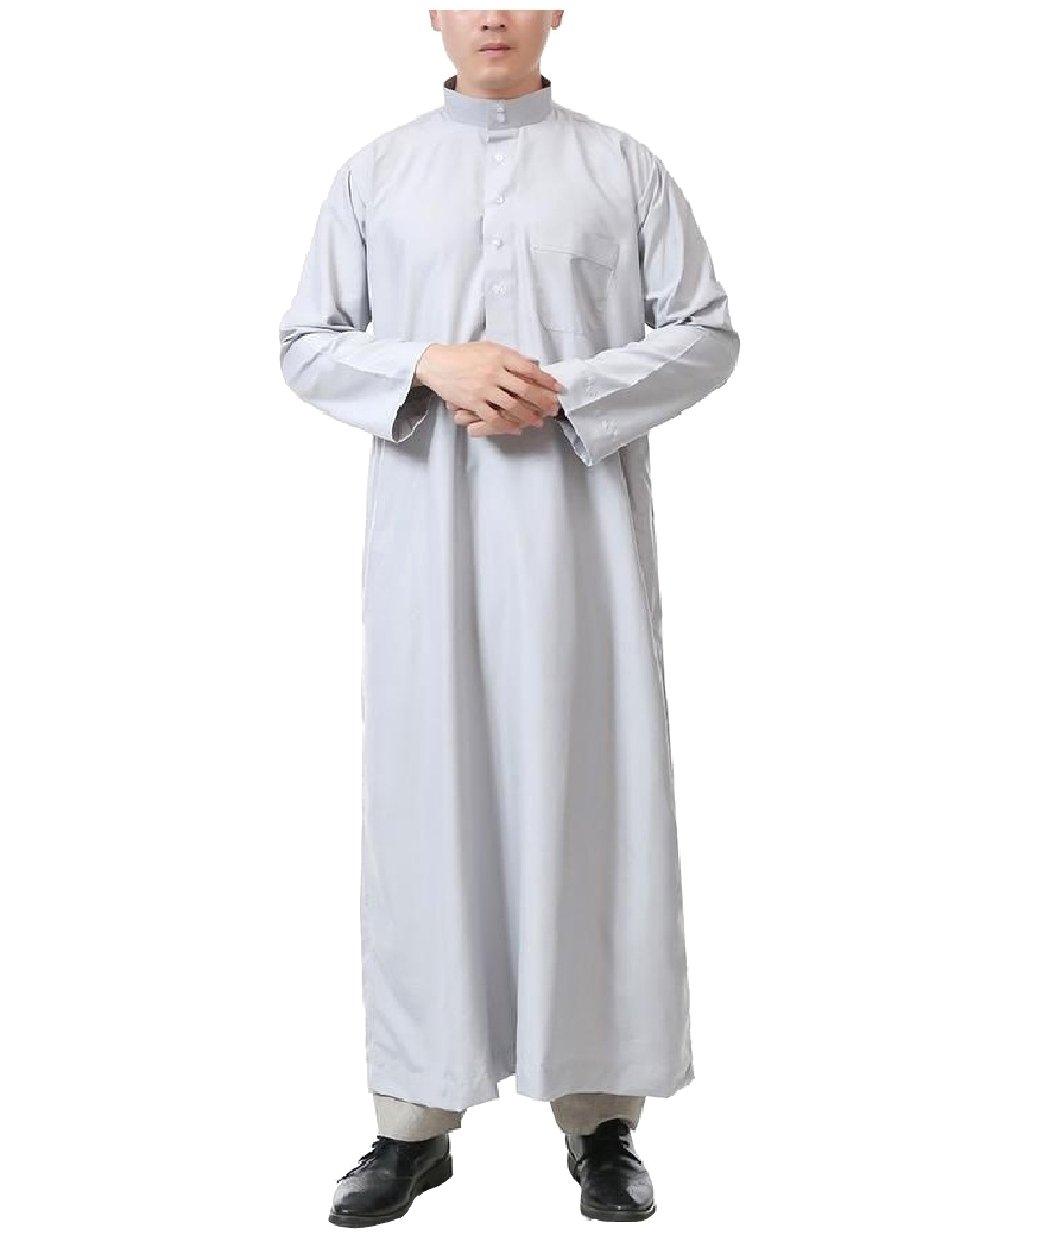 Tootless Mens Islamic With Pockets Saudi Arabia Muslim Thobes Dishdasha Grey 56